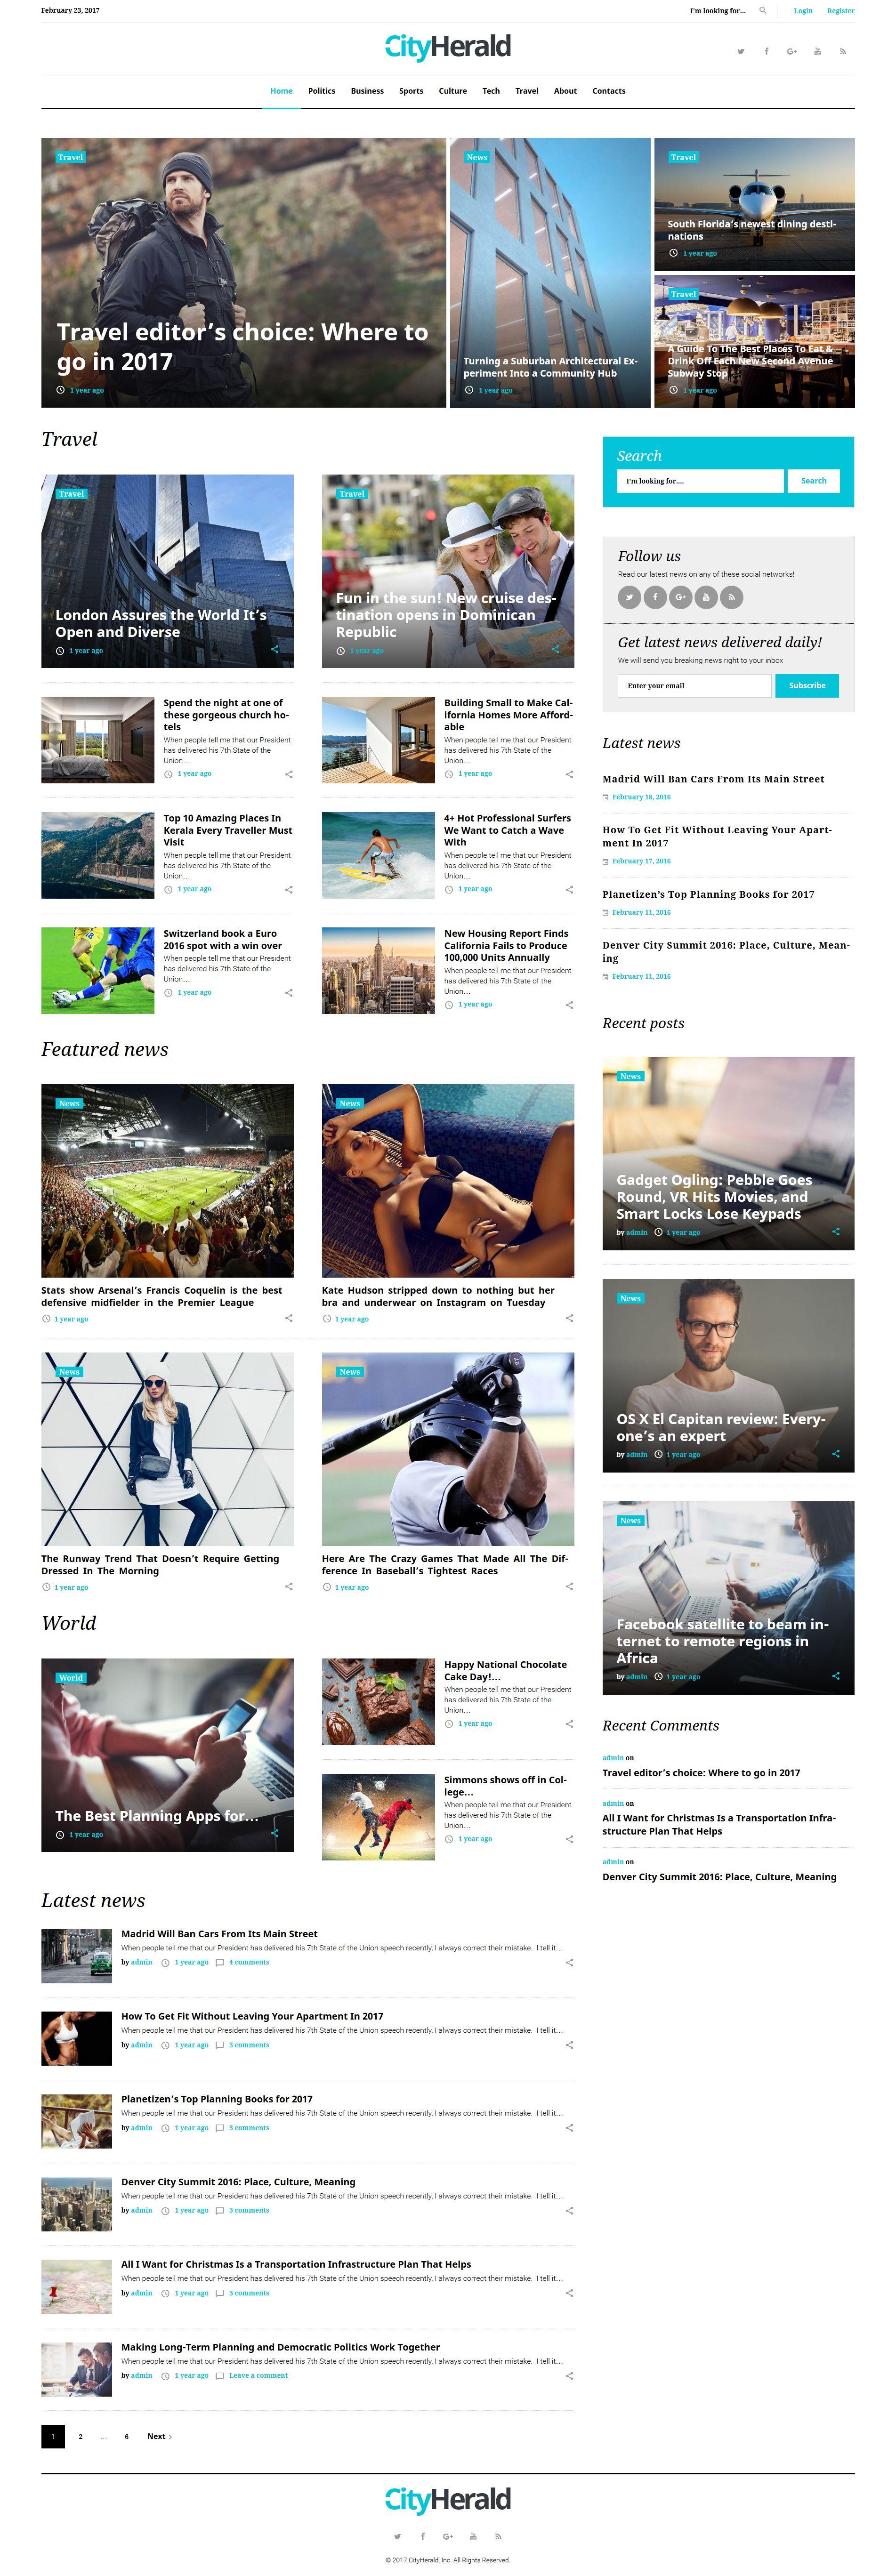 City Herald - Magazine - WordPress Template | Wordpress | Pinterest ...